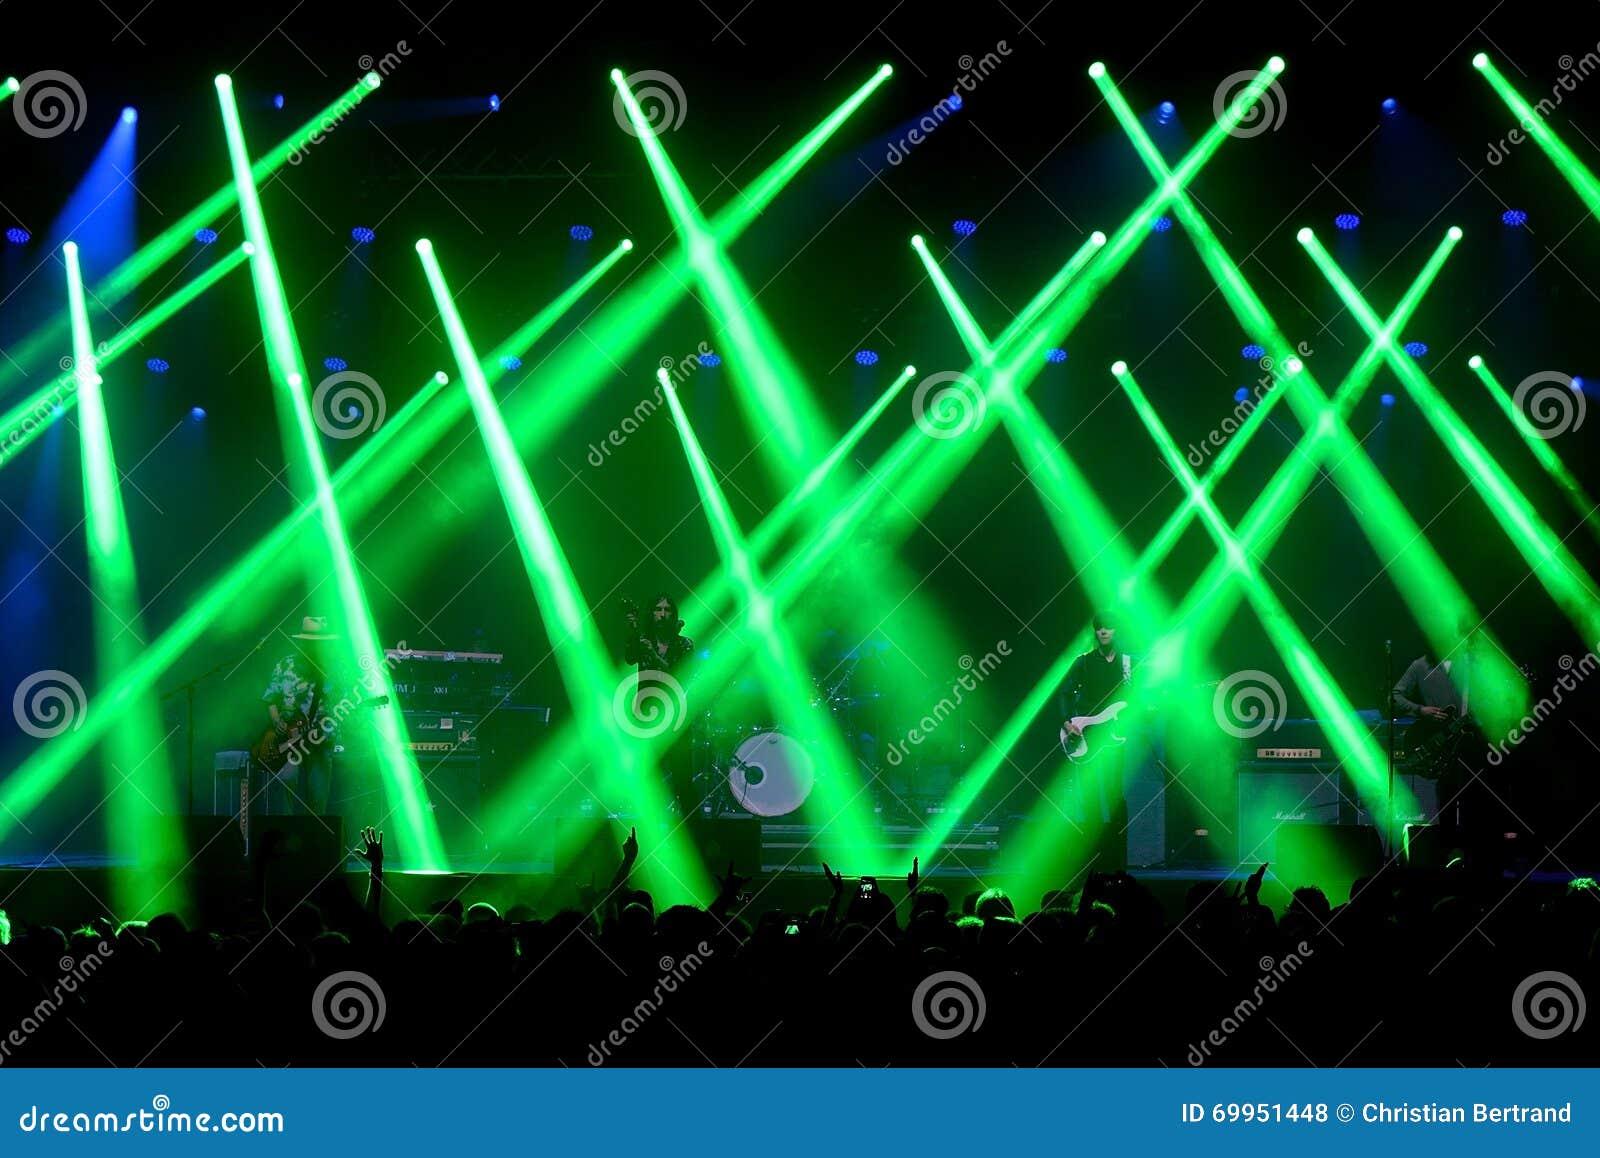 Green Laser Lights At The Primal Scream Band Concert At Vida